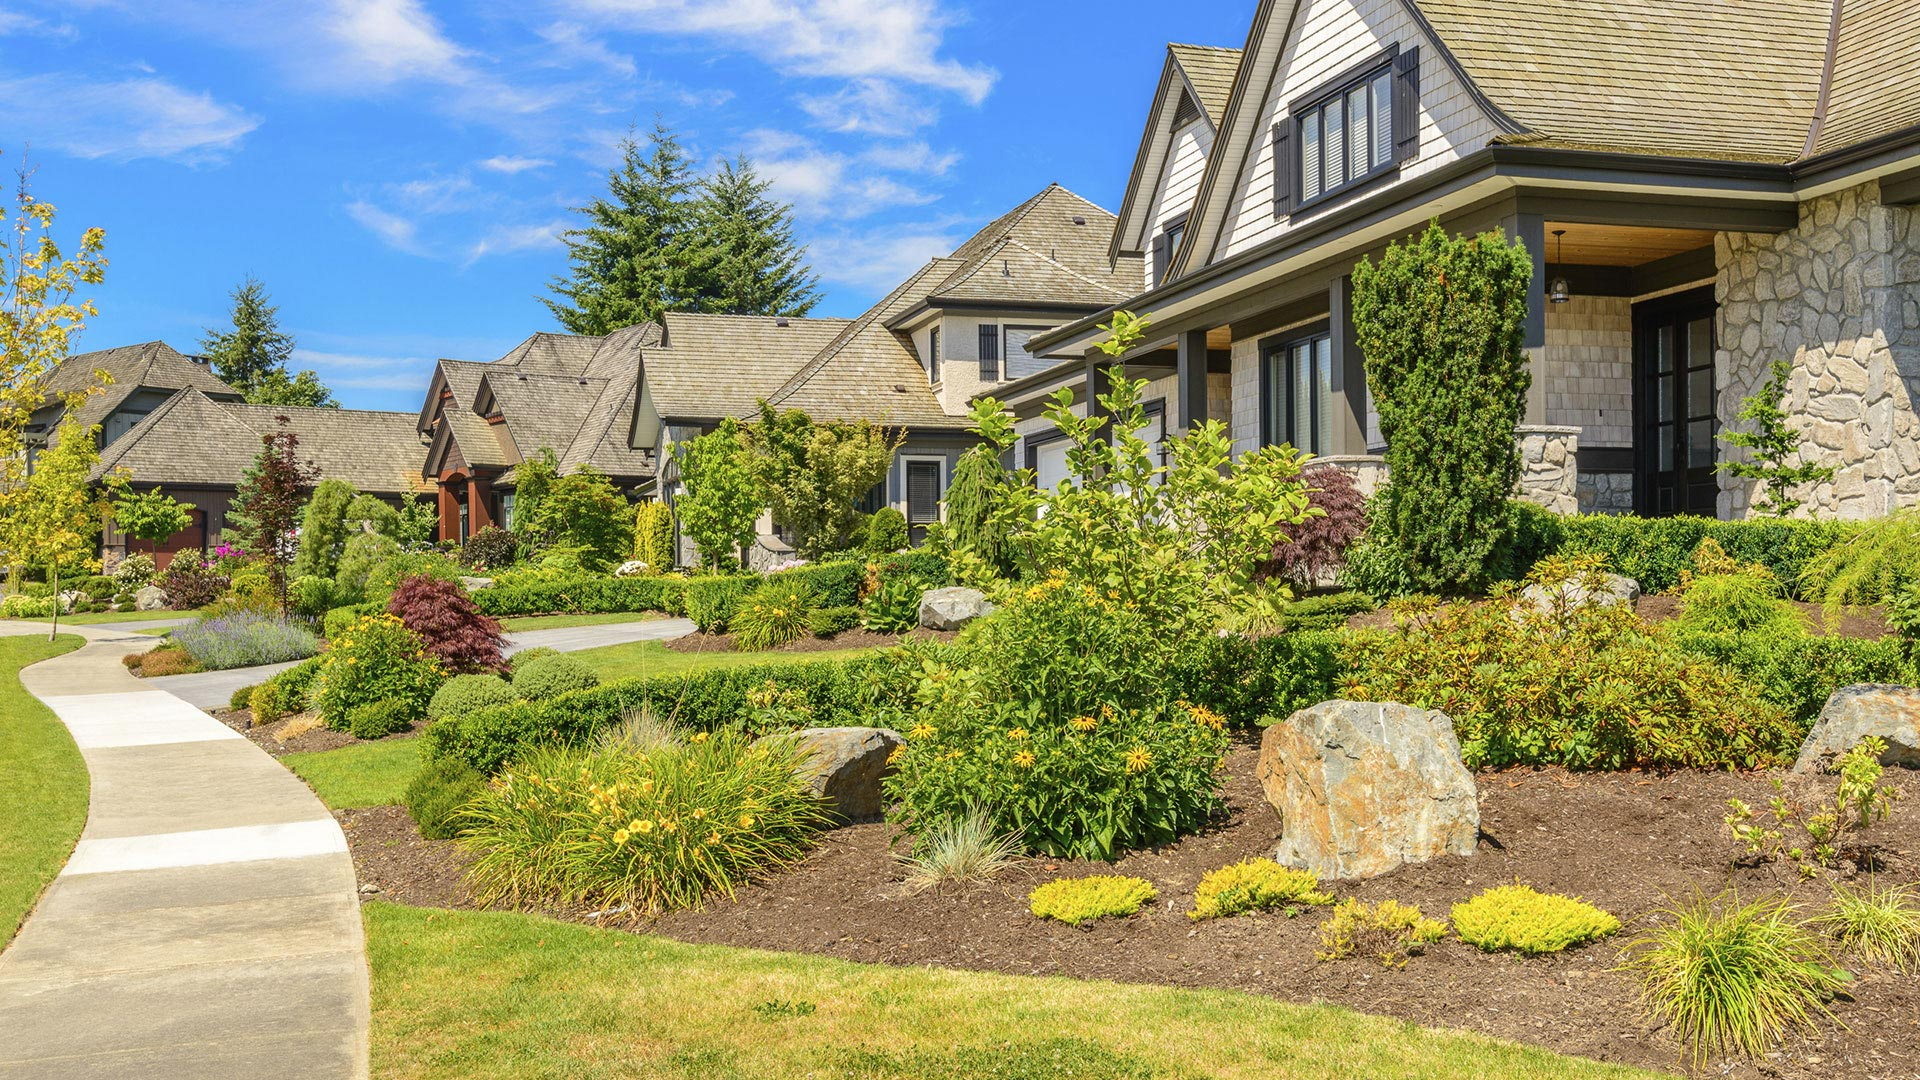 J & E Lawn Service LLC Landscaping, Lawn Maintenance and Irrigation slide 2